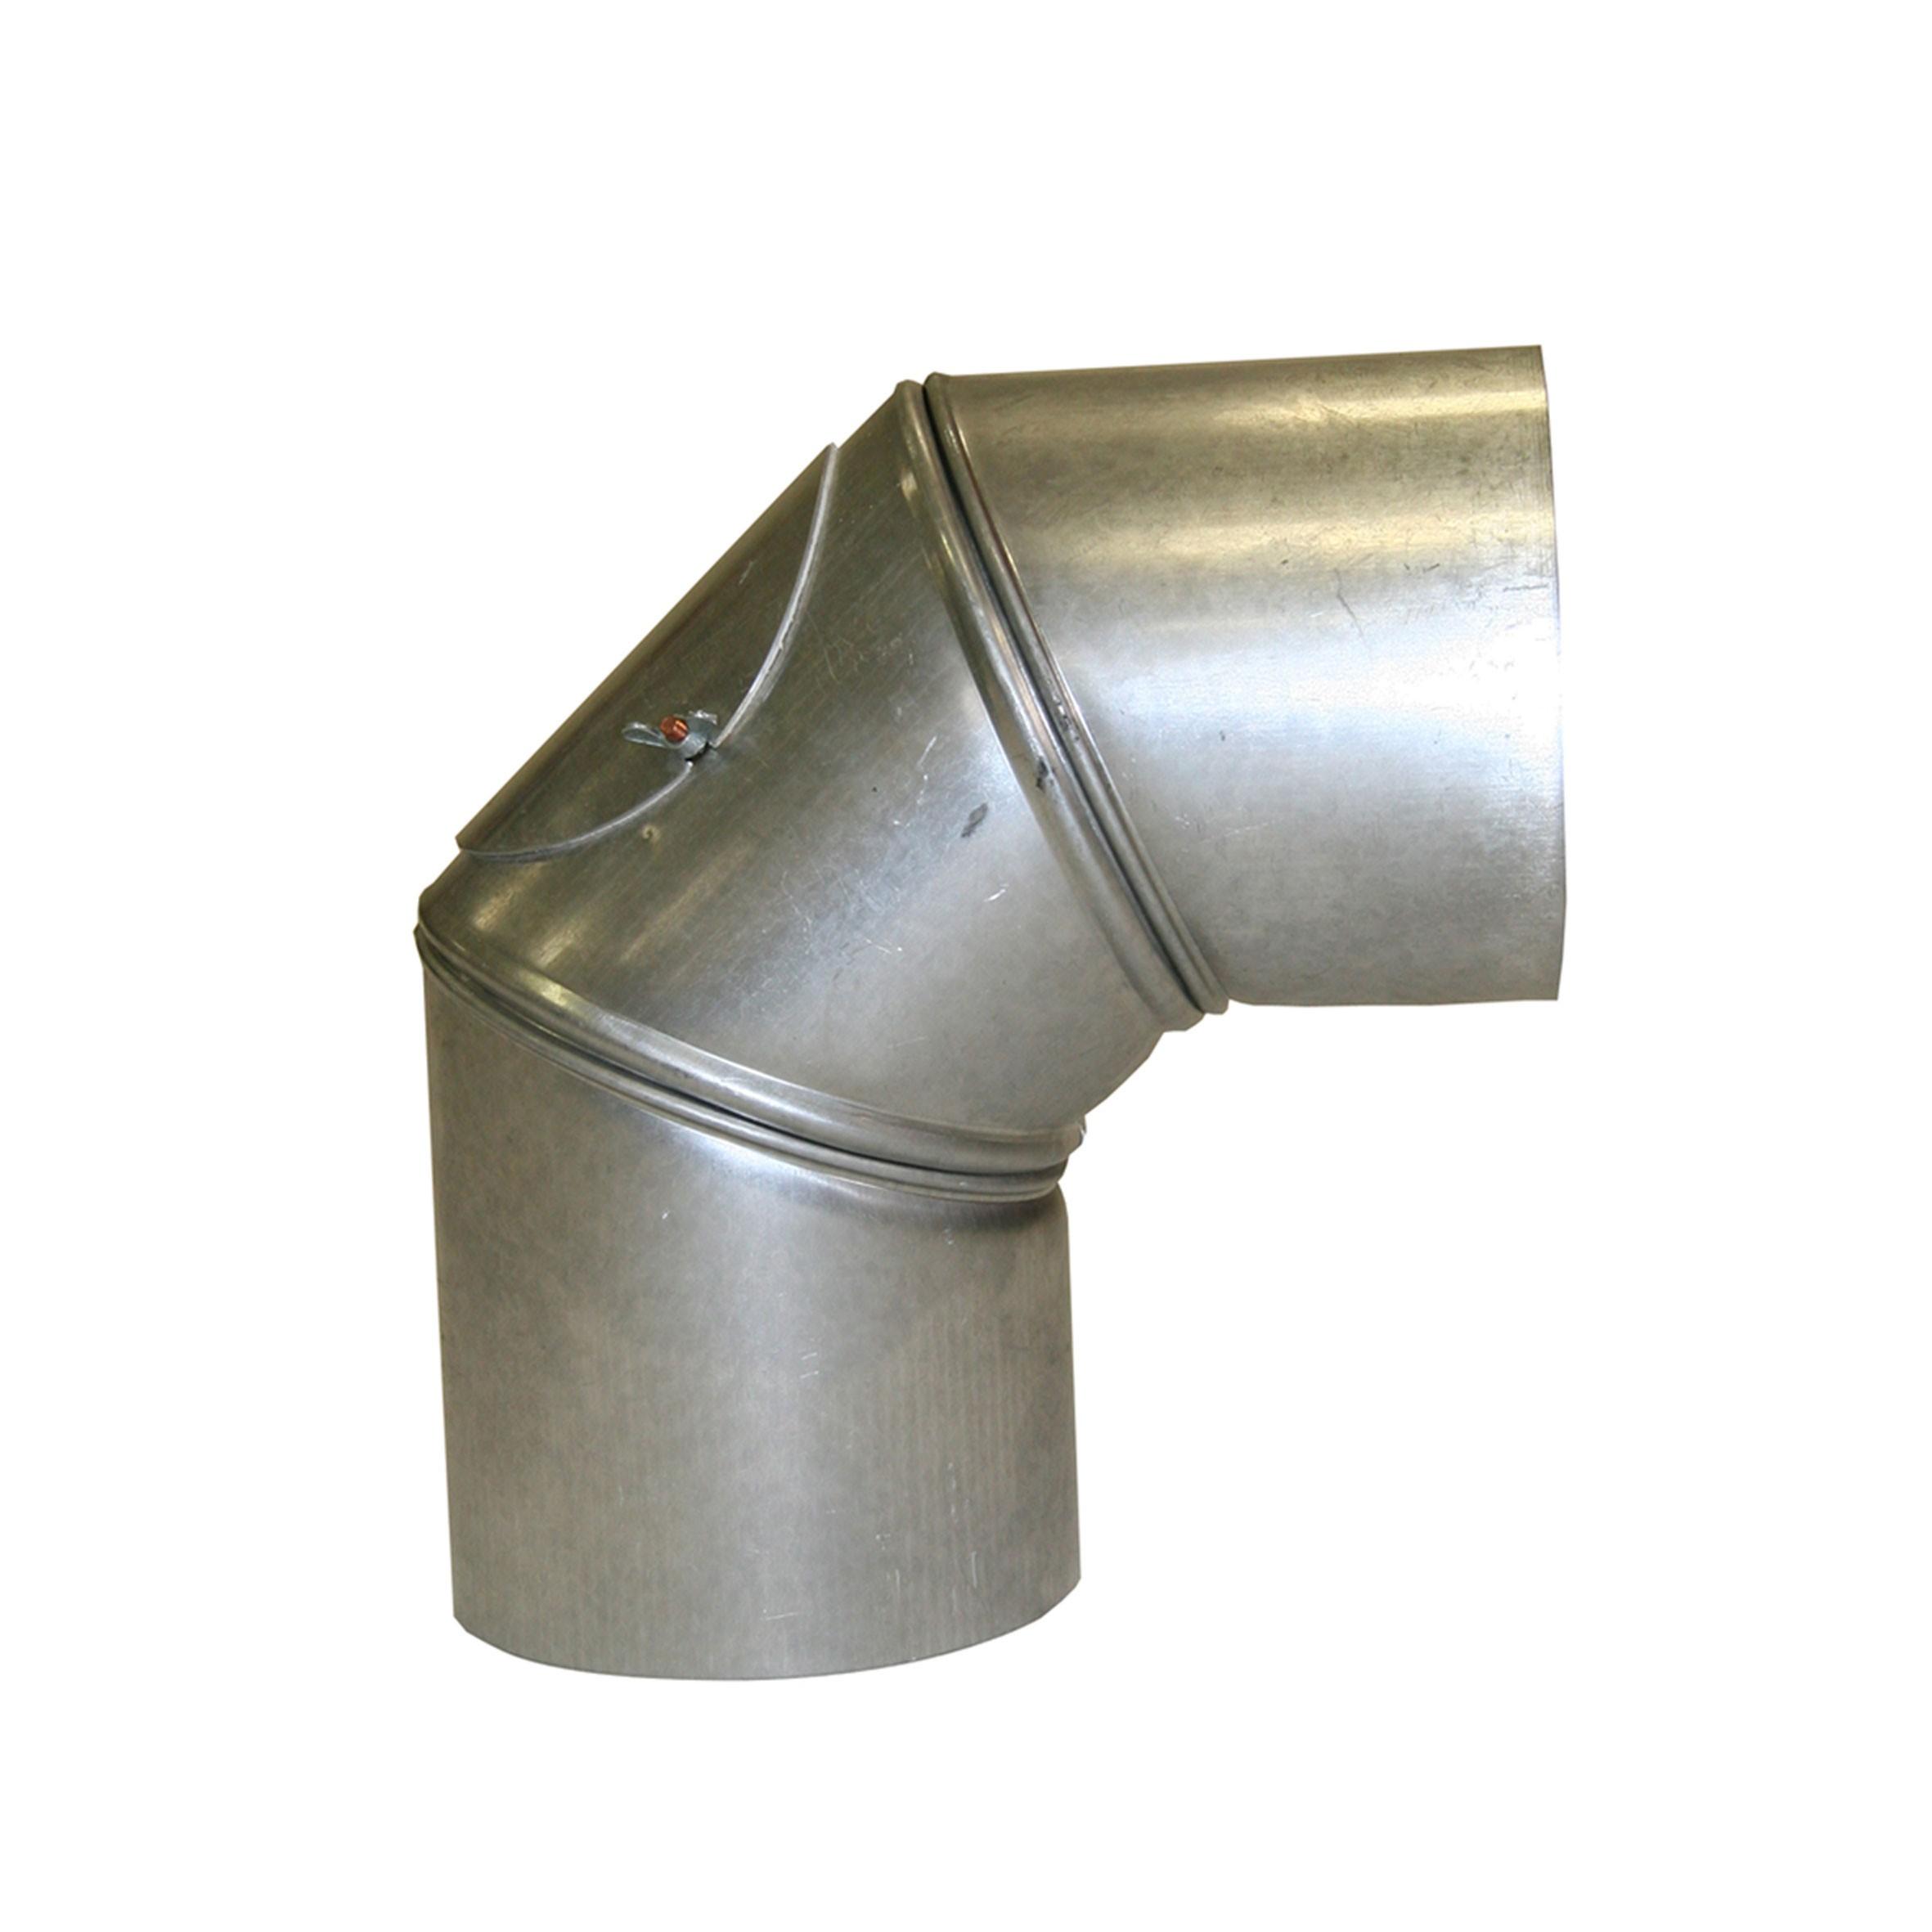 Ofenrohr / Rauchrohr KaminoFlam FAL Bogenknie 90° Ø150mm 3tlg. mit Tür Bild 1